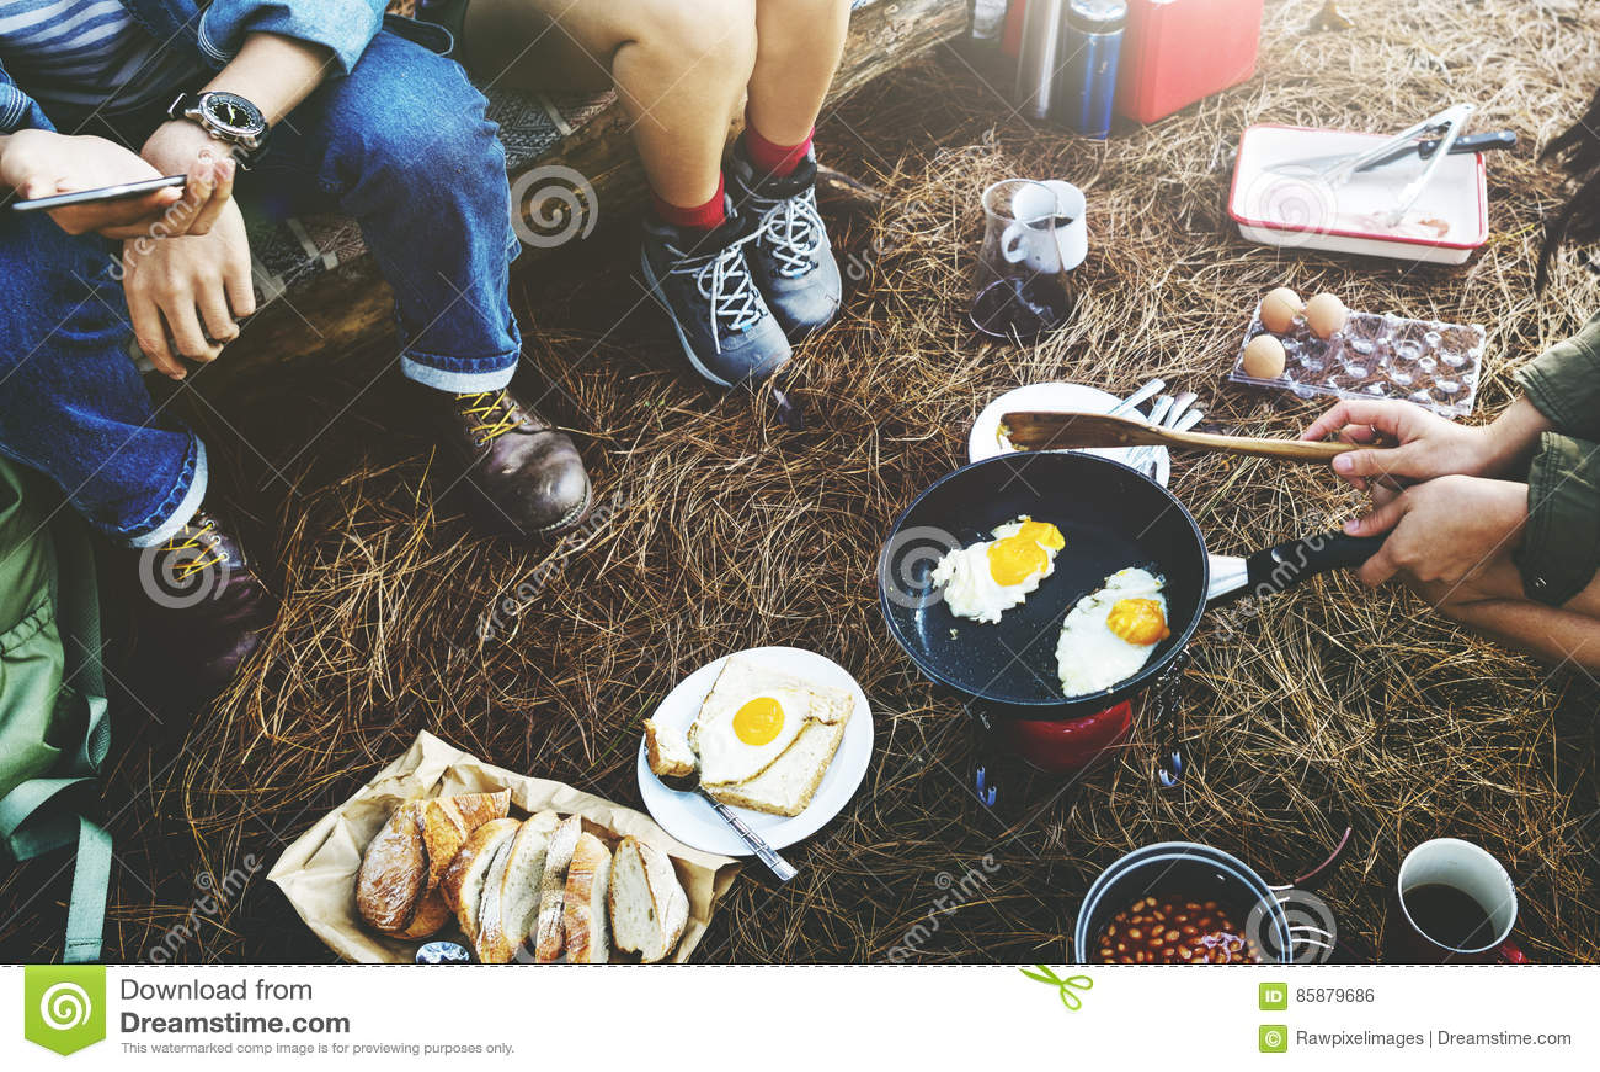 De Reisconcept van ontbijtbean egg bread coffee camping